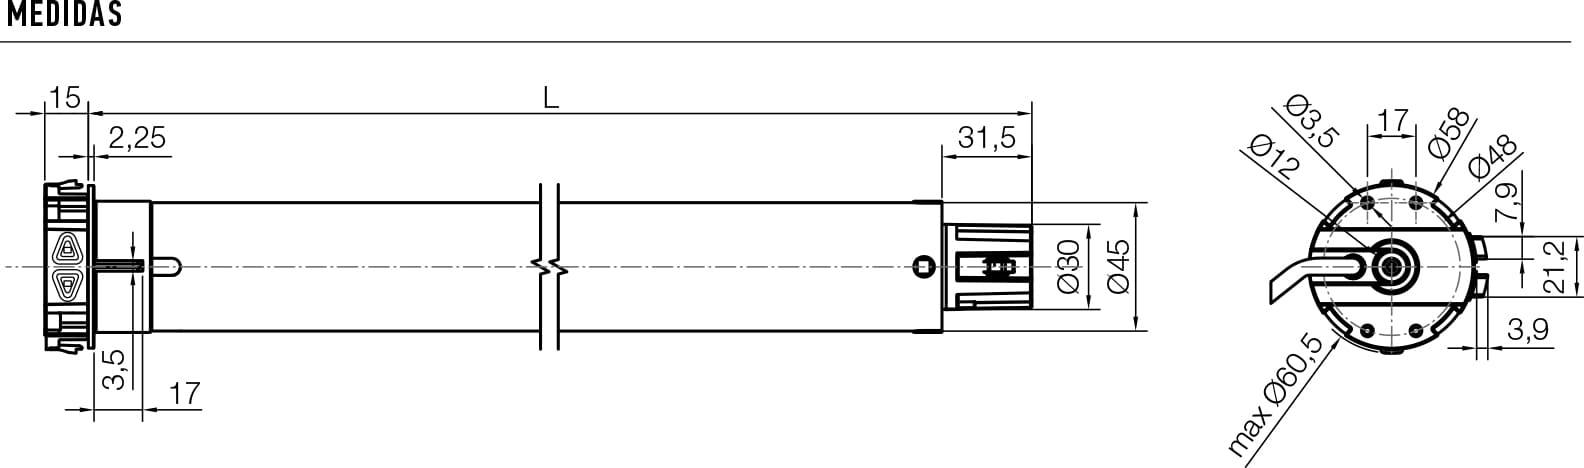 caracteristicas-plus-m-2